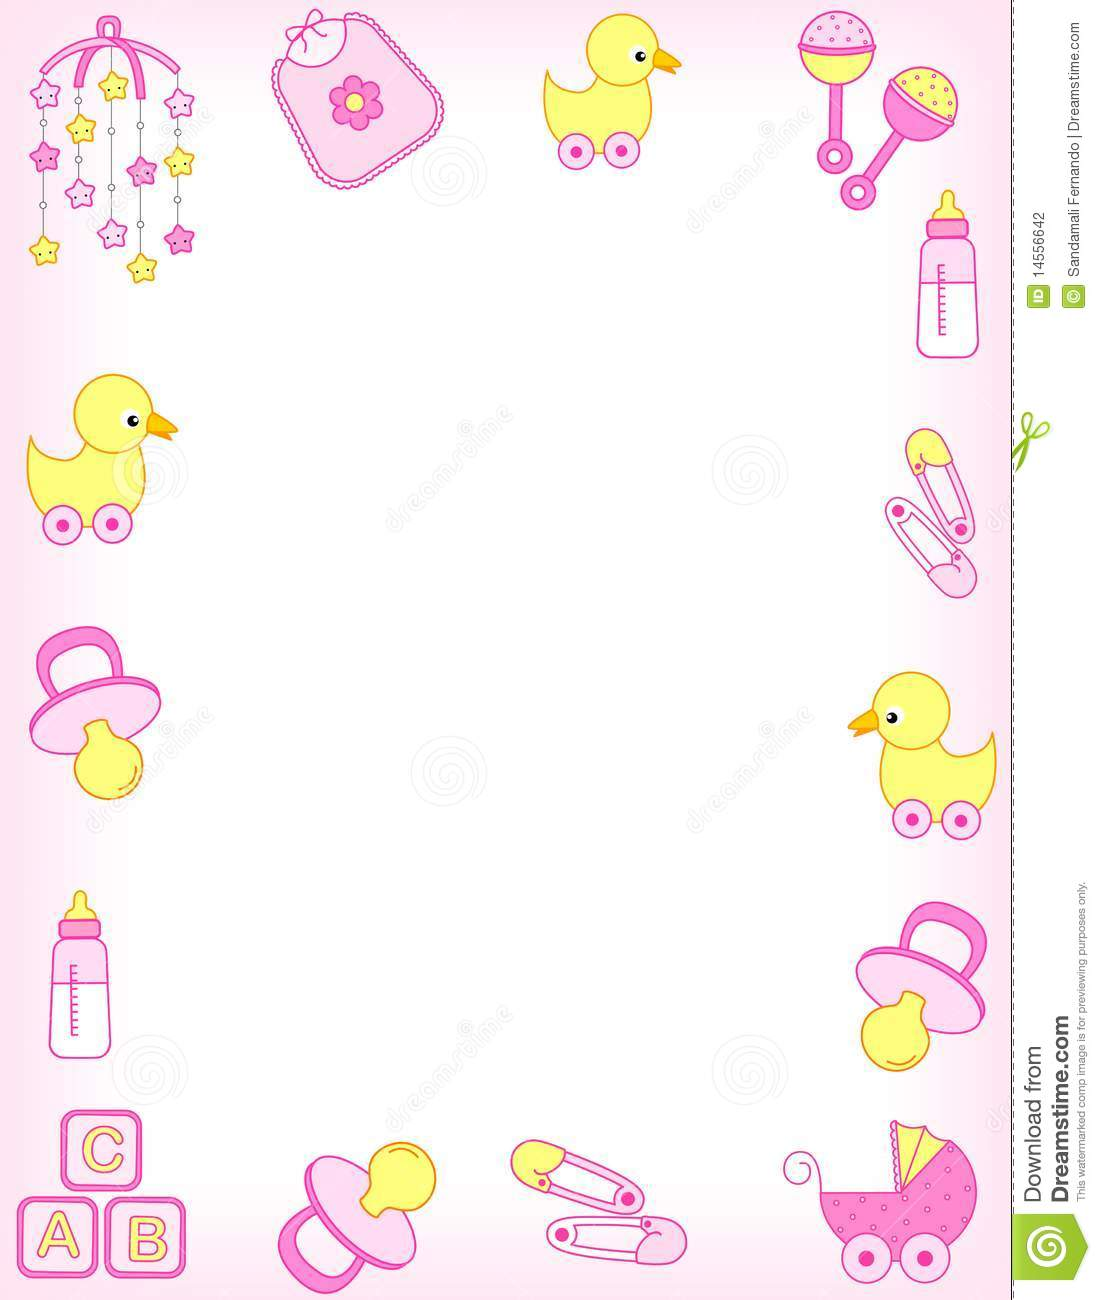 Baby clipart border. Img clipartxtras com bd